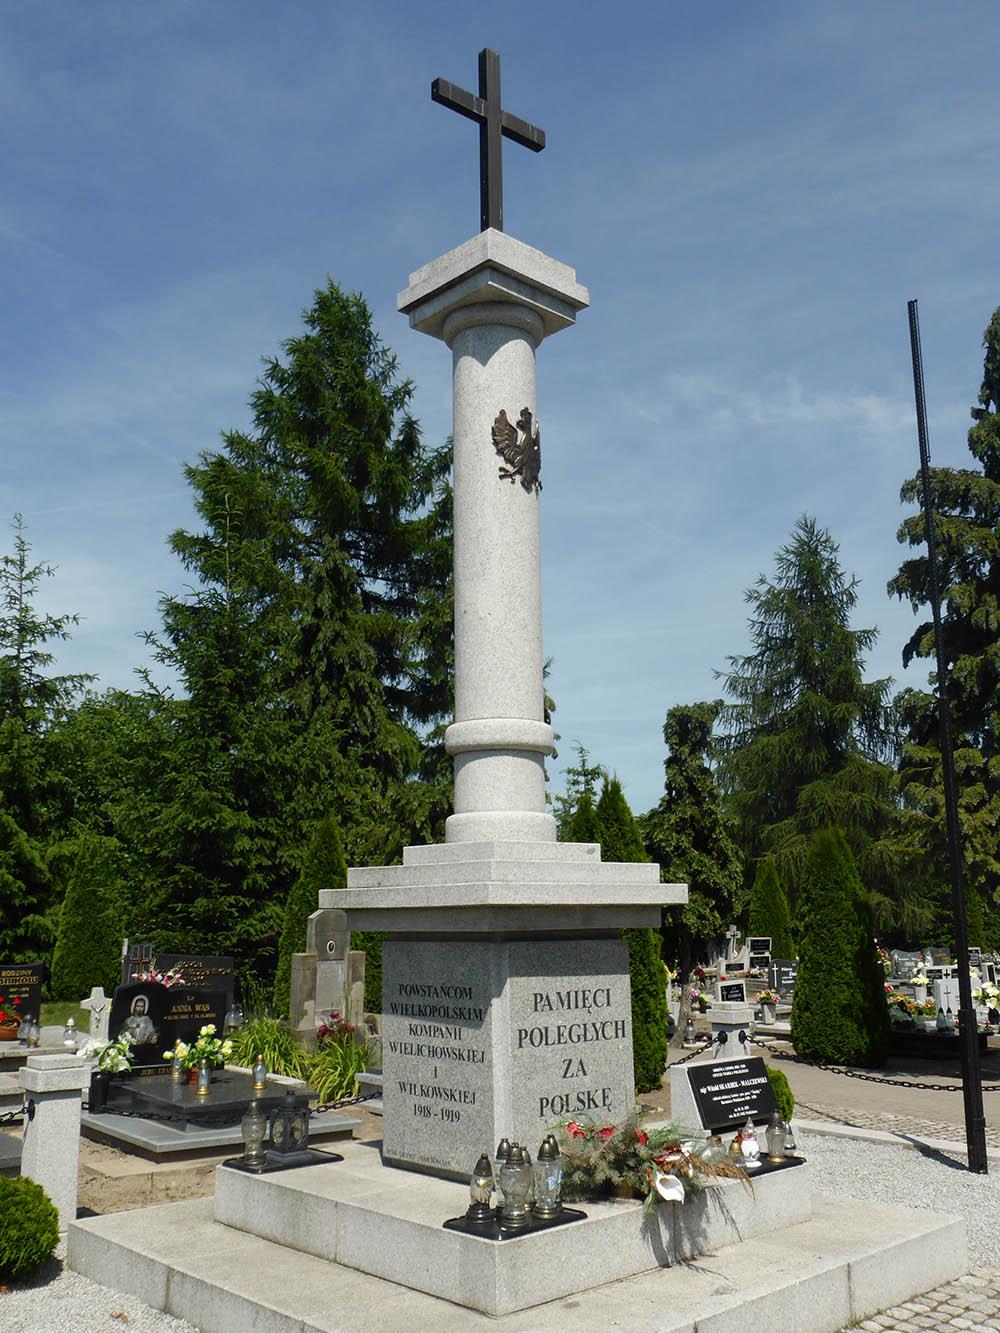 Wielkopolska Uprising Memorial